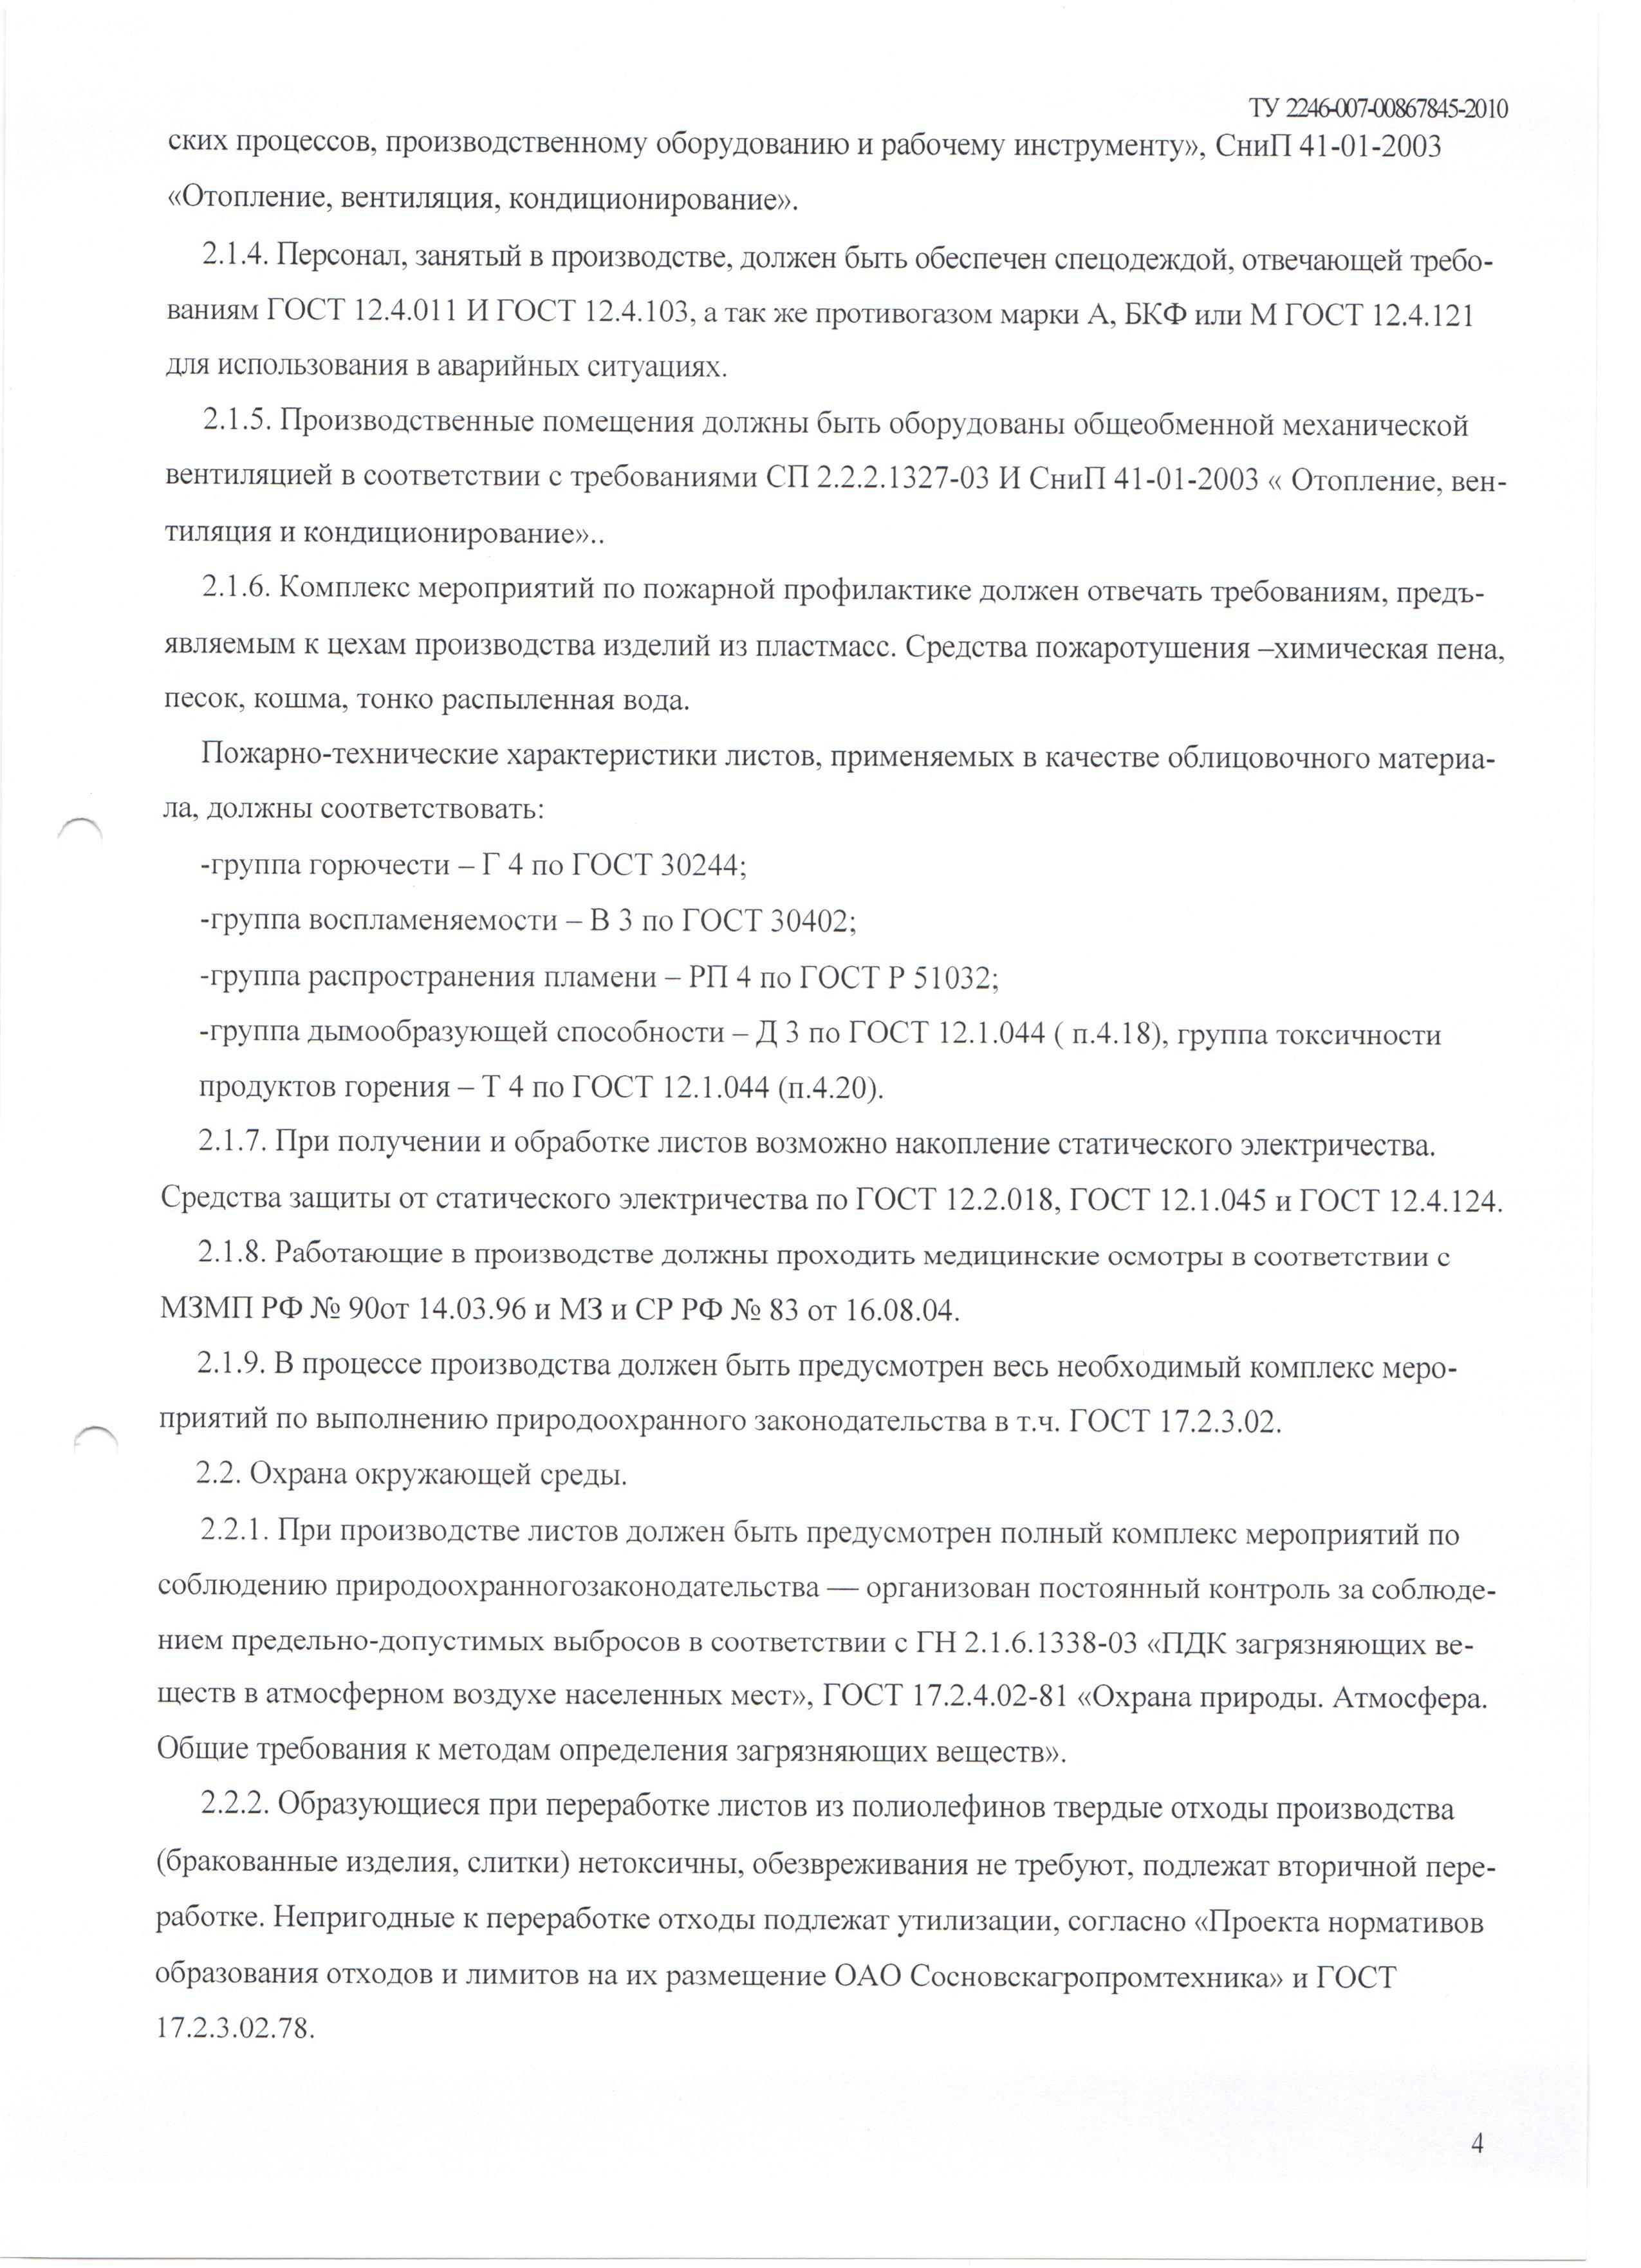 TU-005